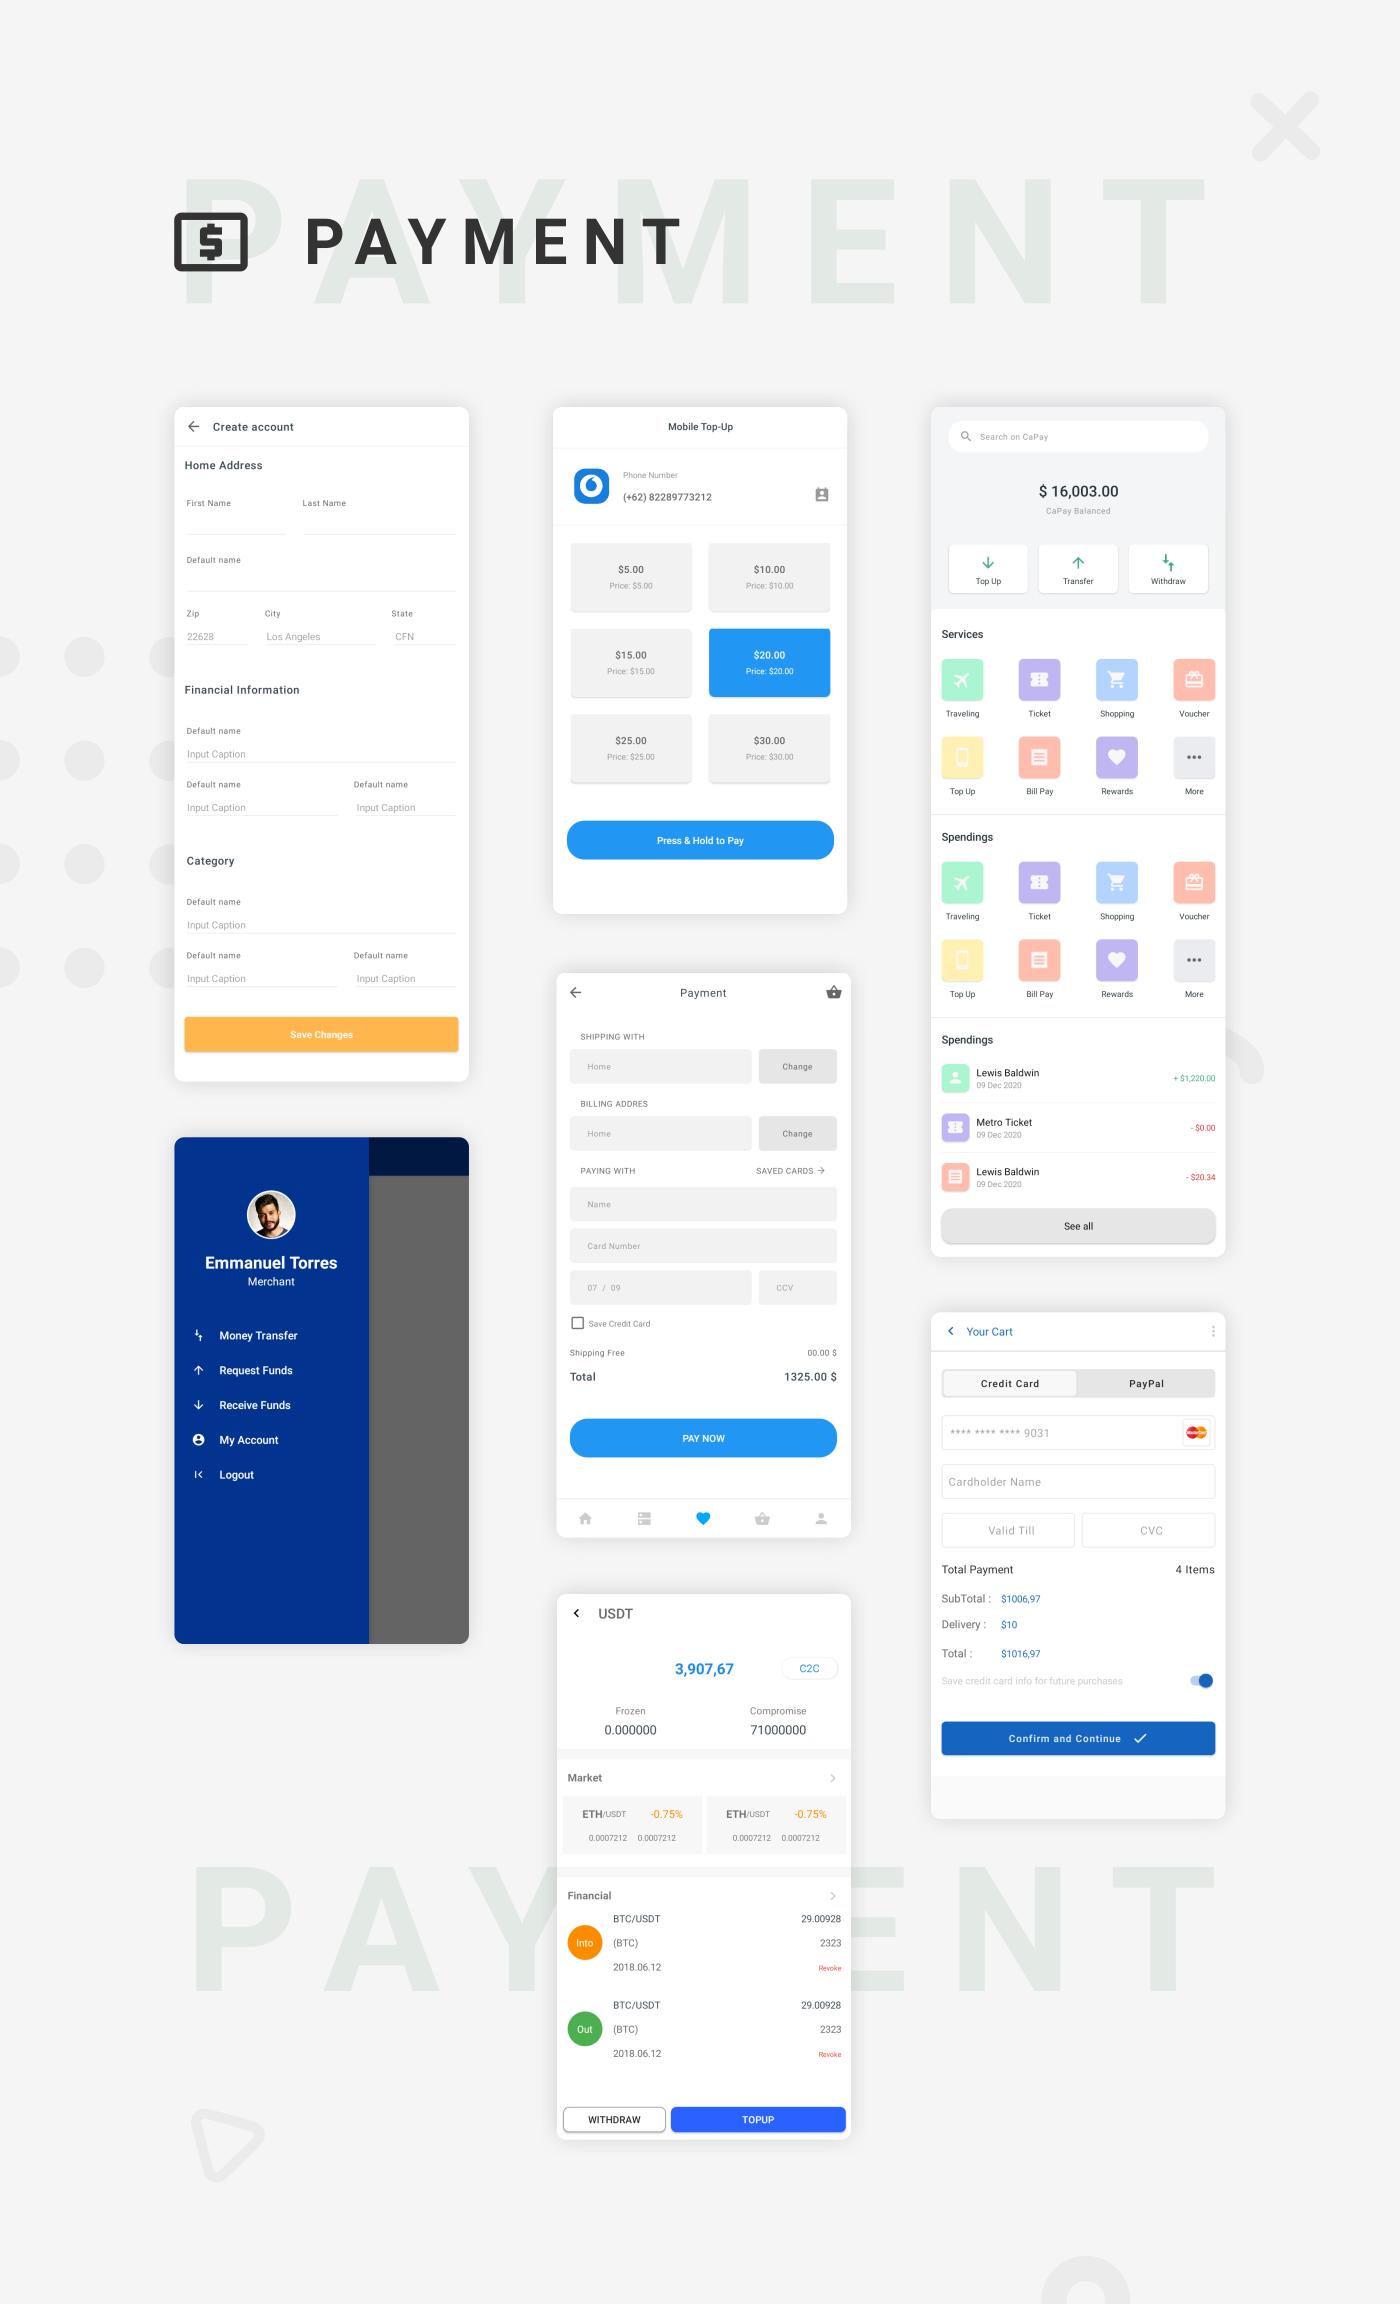 EcommerceX - Premium Ecommerce App UI Kit Template 1.0 - 4